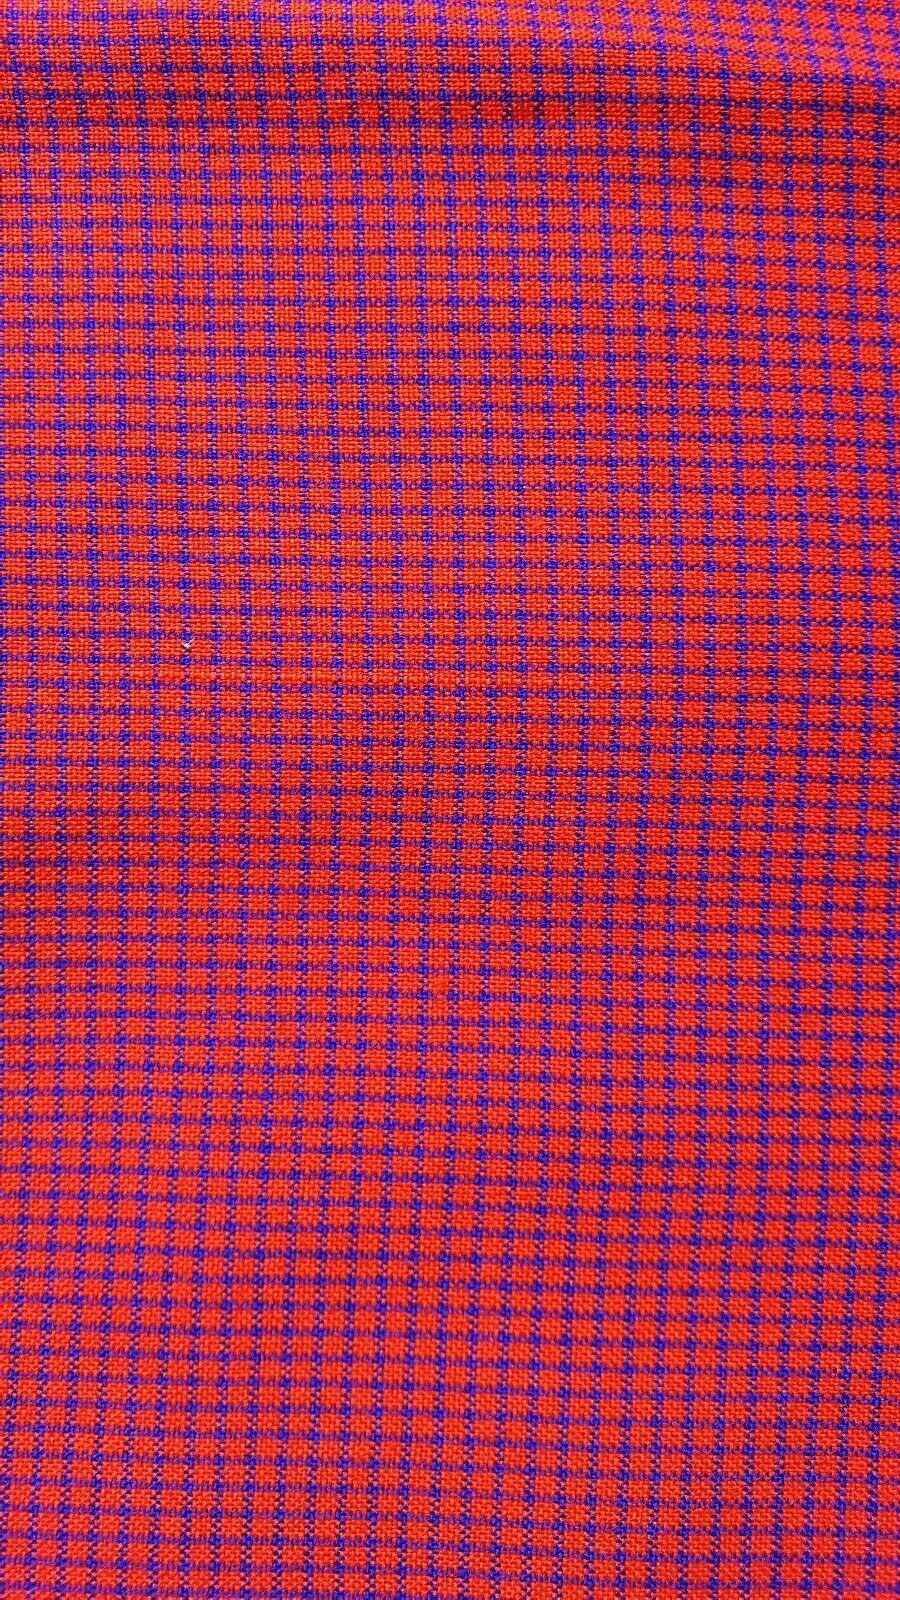 African Masai Maasai Tribal Shuka Throw Blanket Wrap Pink